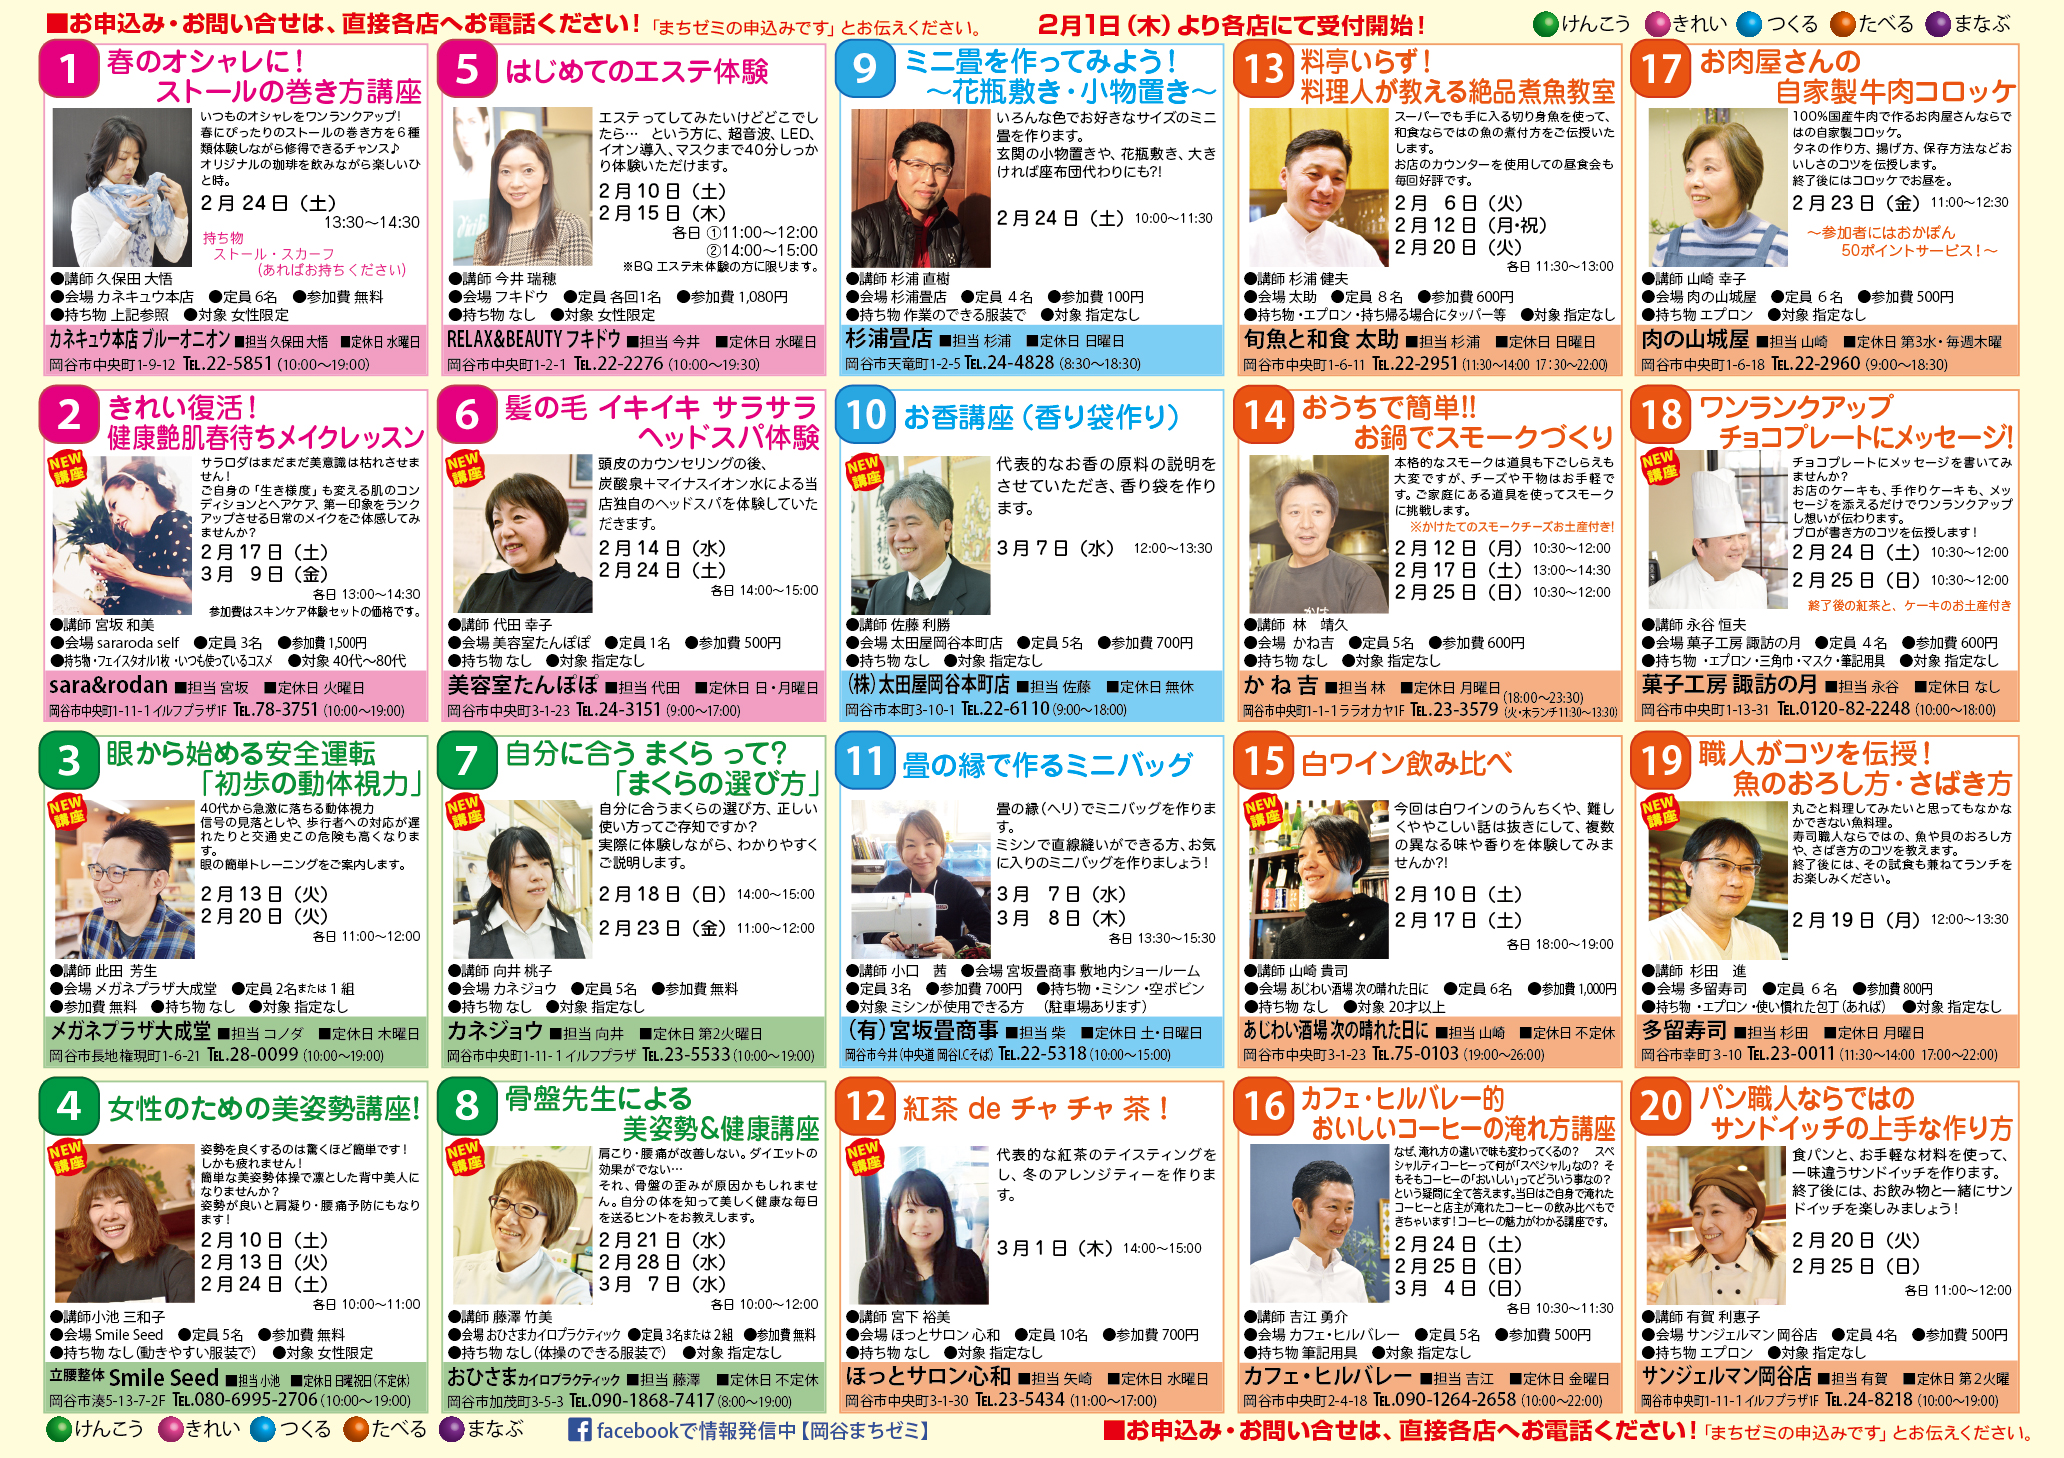 http://www.okayacci.or.jp/tmo/images/%E3%81%BE%E3%81%A1%E3%82%BC%E3%83%9F%E3%83%81%E3%83%A9%E3%82%B7%E8%A3%8F.jpg